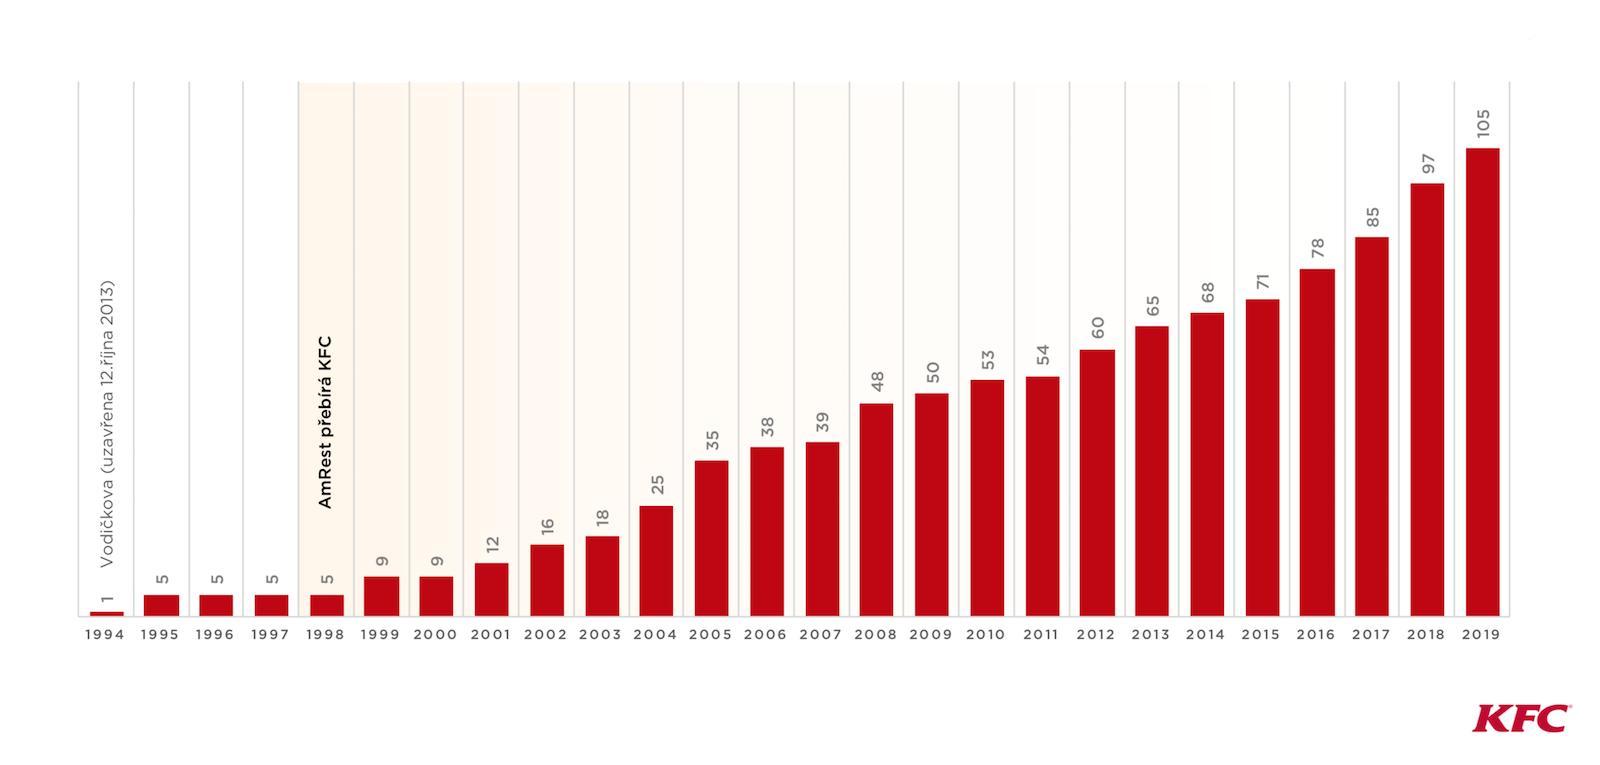 Vývoj počtu provozoven KFC v Česku